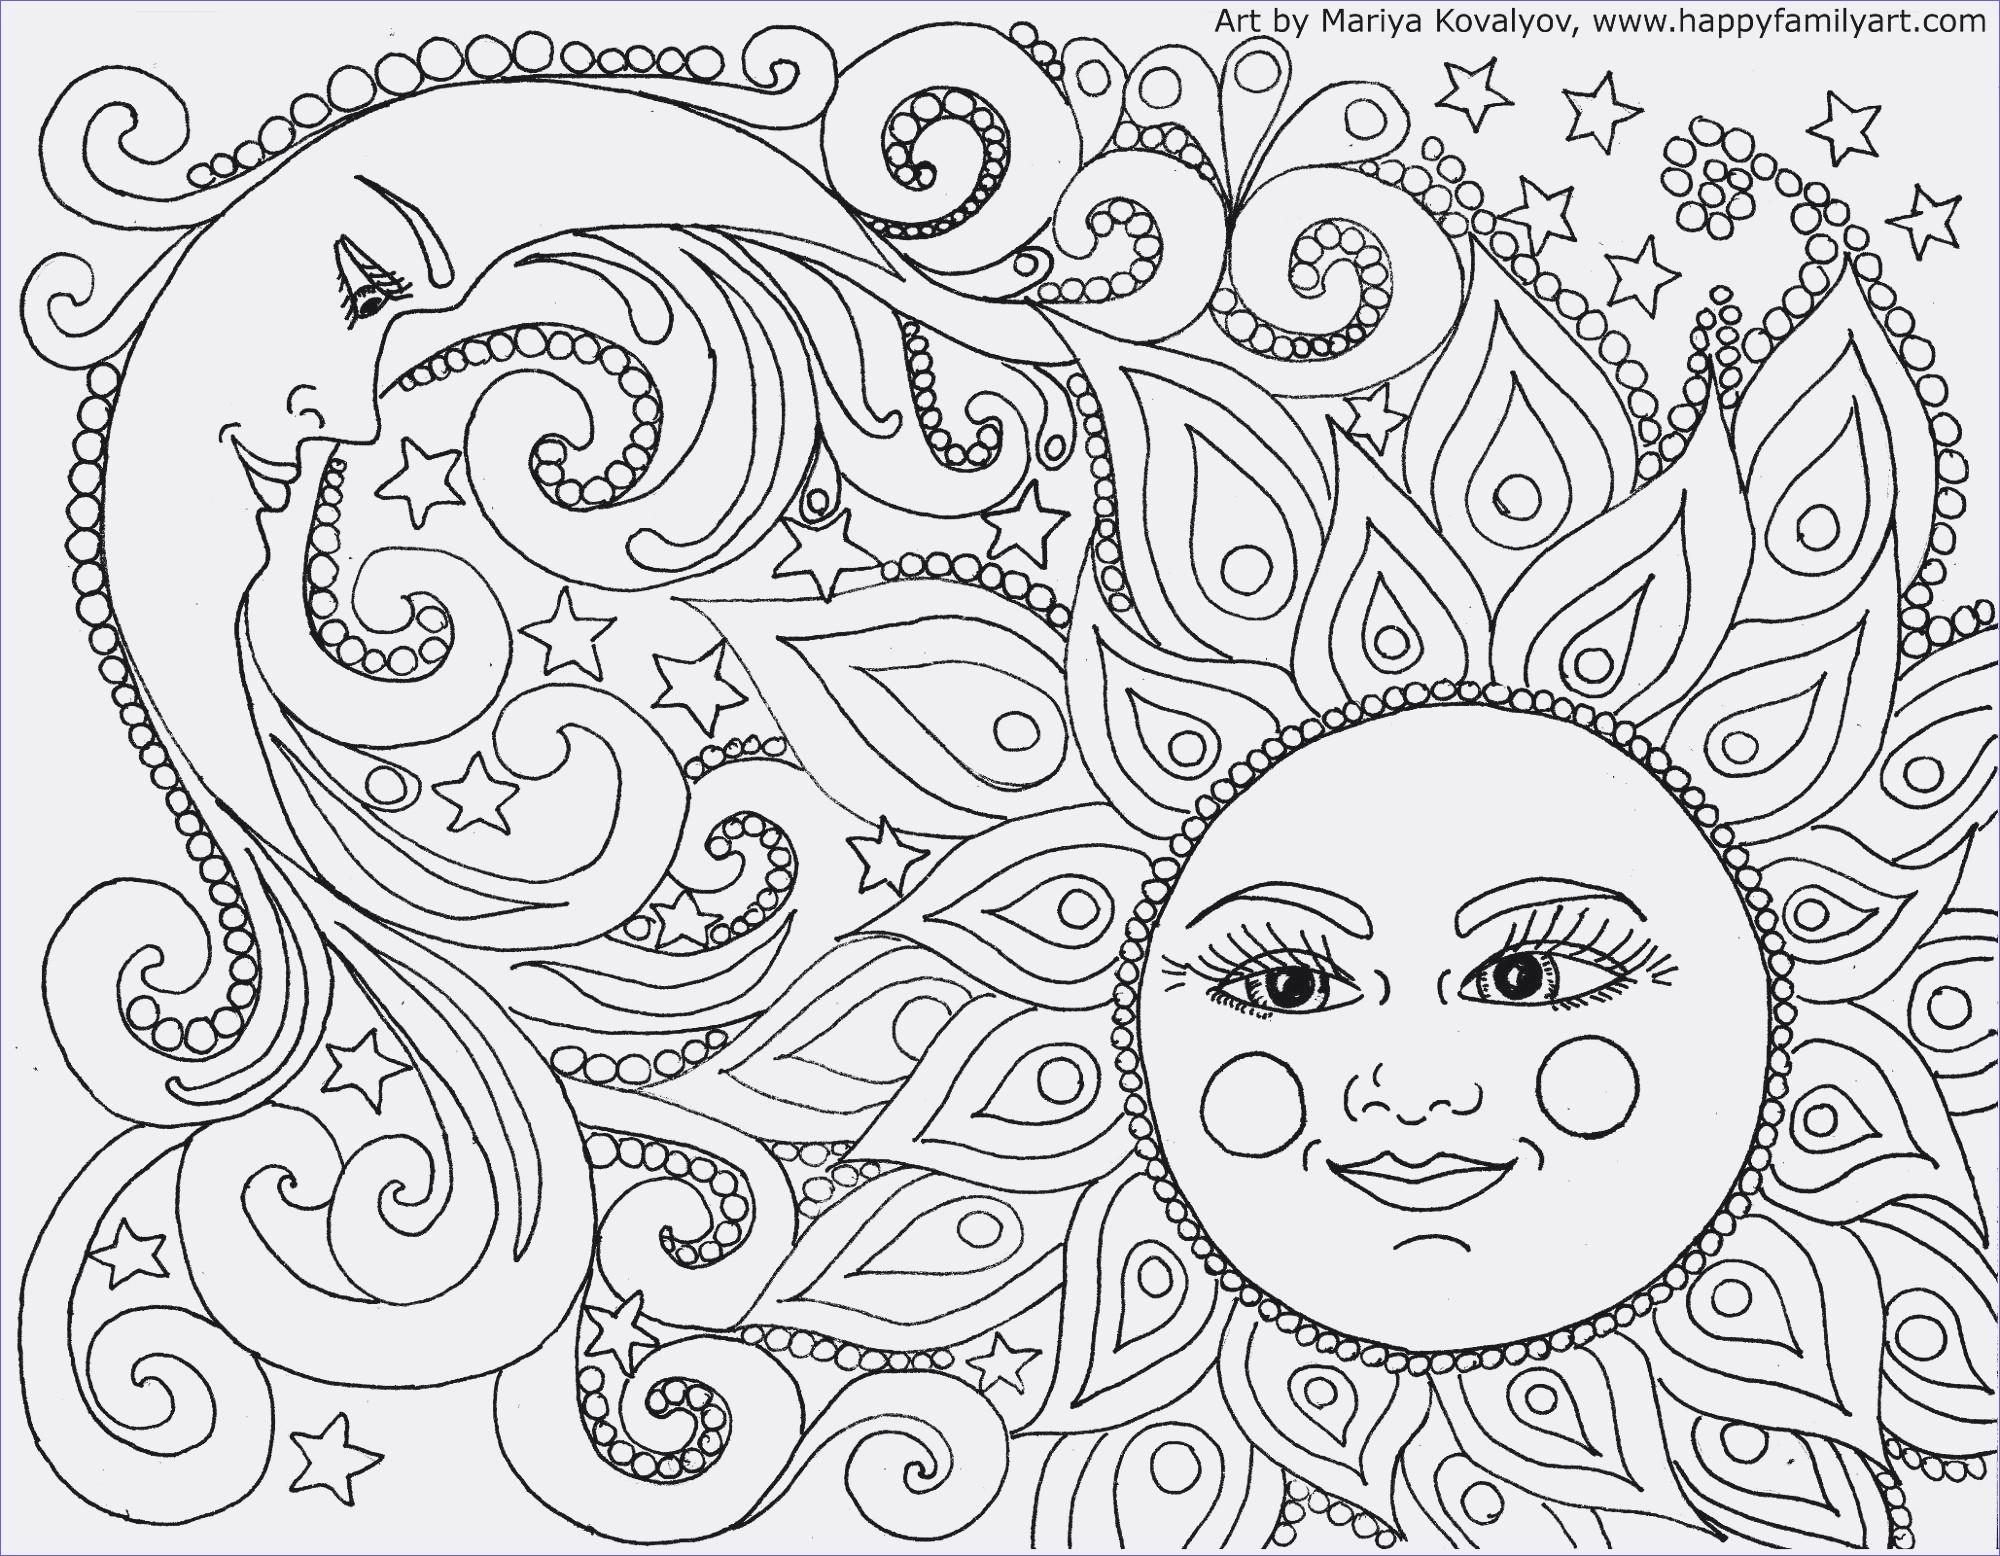 Ausmalbilder Mandala Herzen Inspirierend Ausmalbilder Mandala Erwachsene Spannende Coloring Bilder Galerie